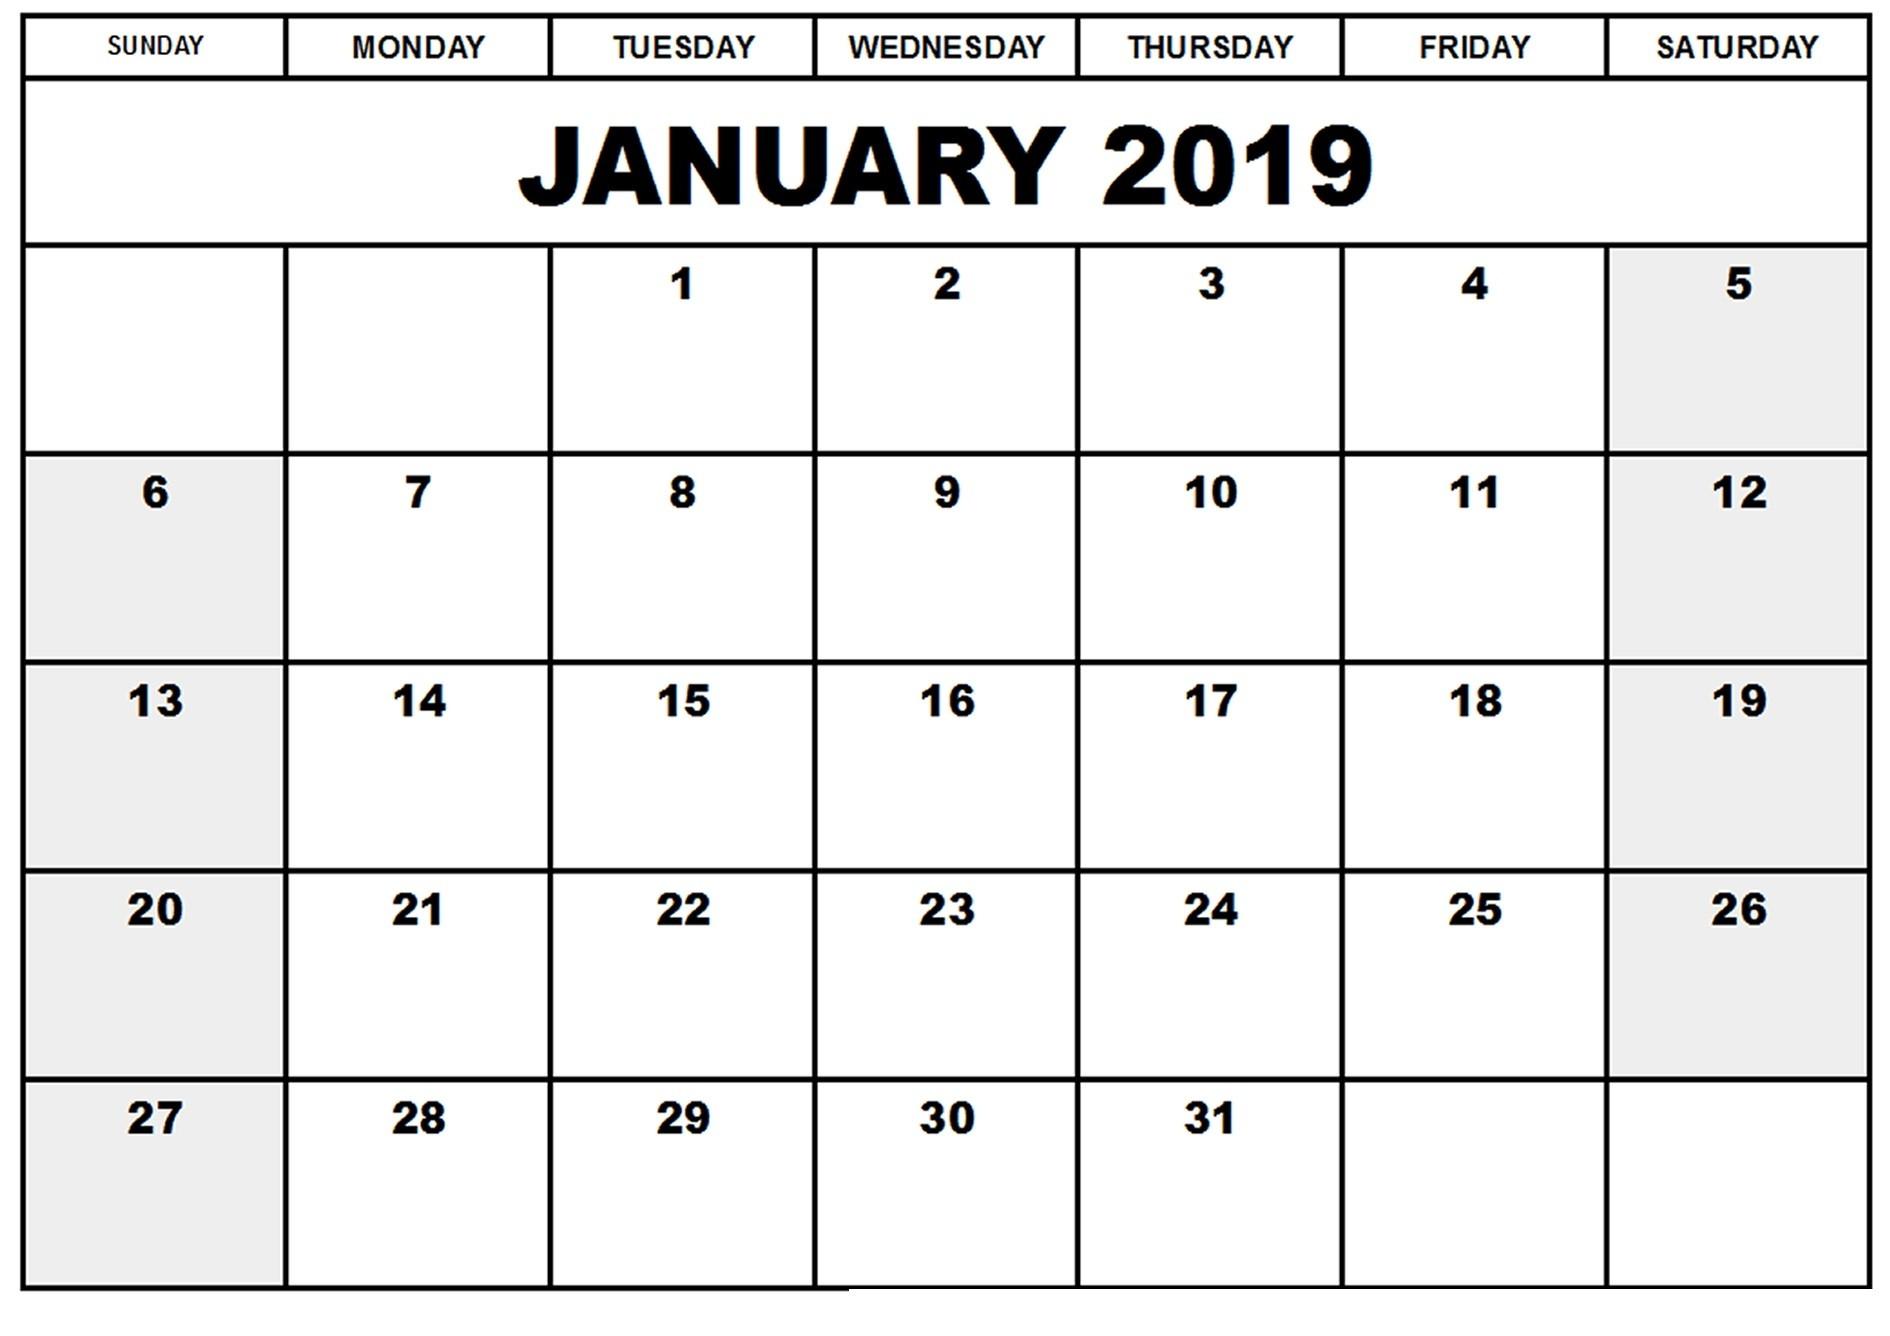 Get Free Printable January 2019 Calendar with Holidays